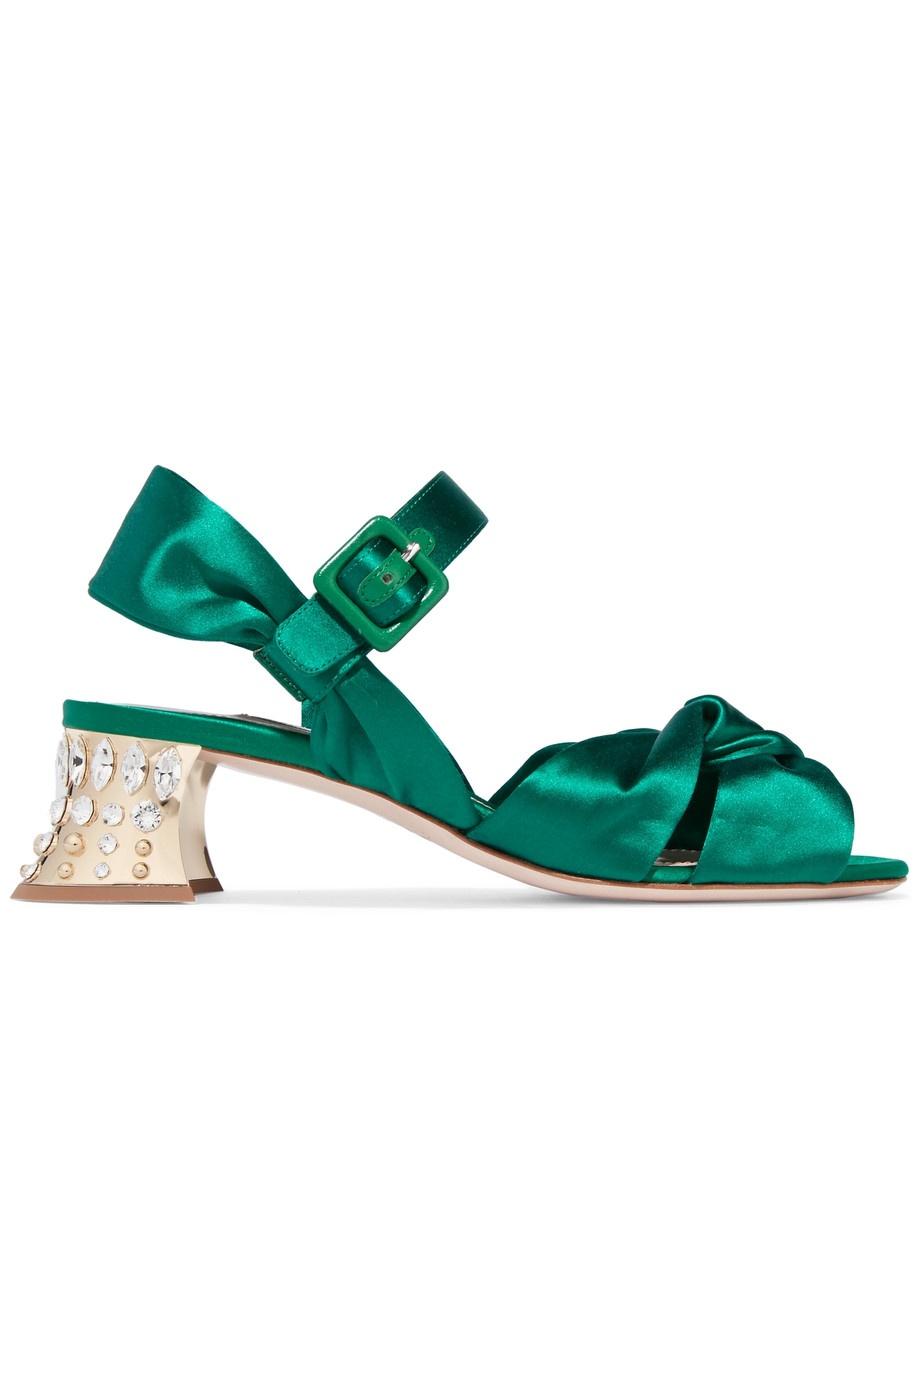 MIU MIU - Swarovski crystal-embellished satin sandals